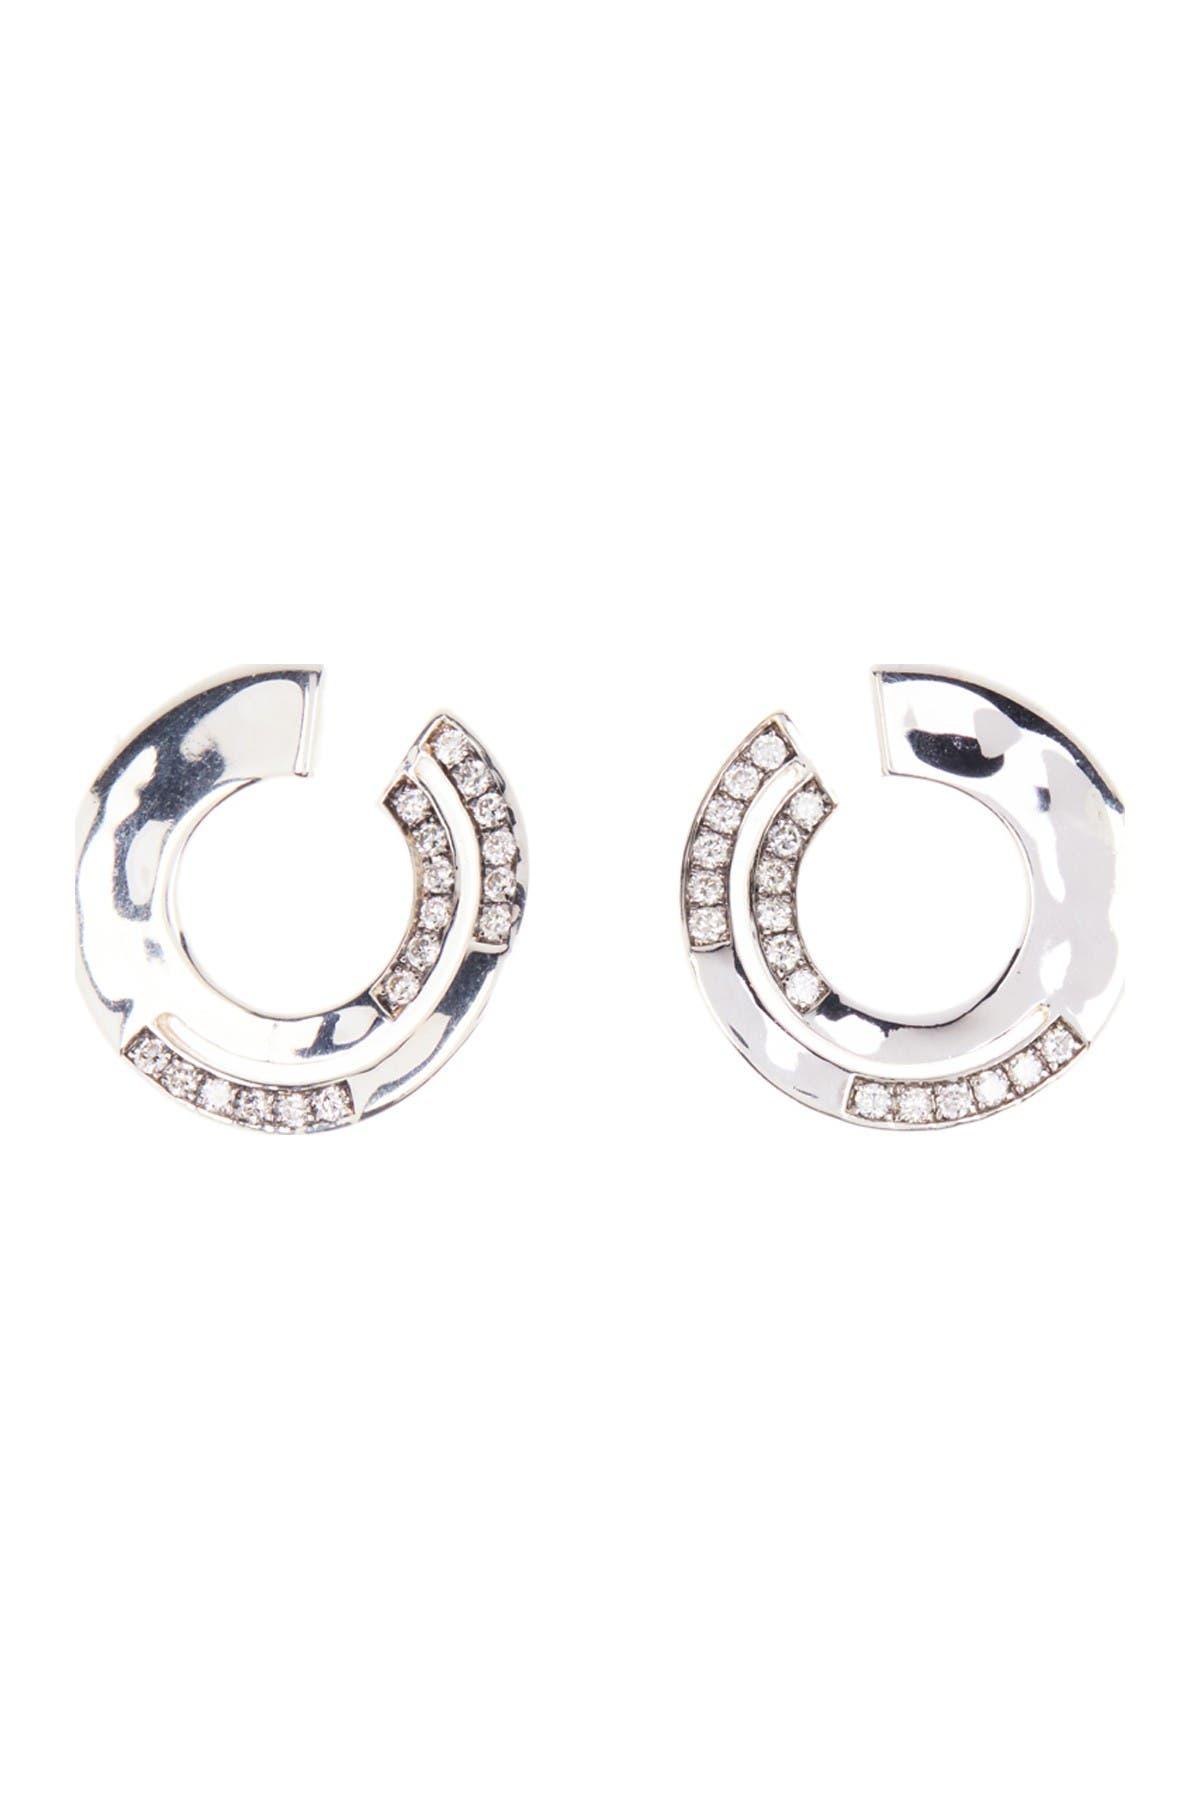 Image of Ippolita Prisma Silver Pave Diamond Circle Stud Earrings - 0.45 ctw